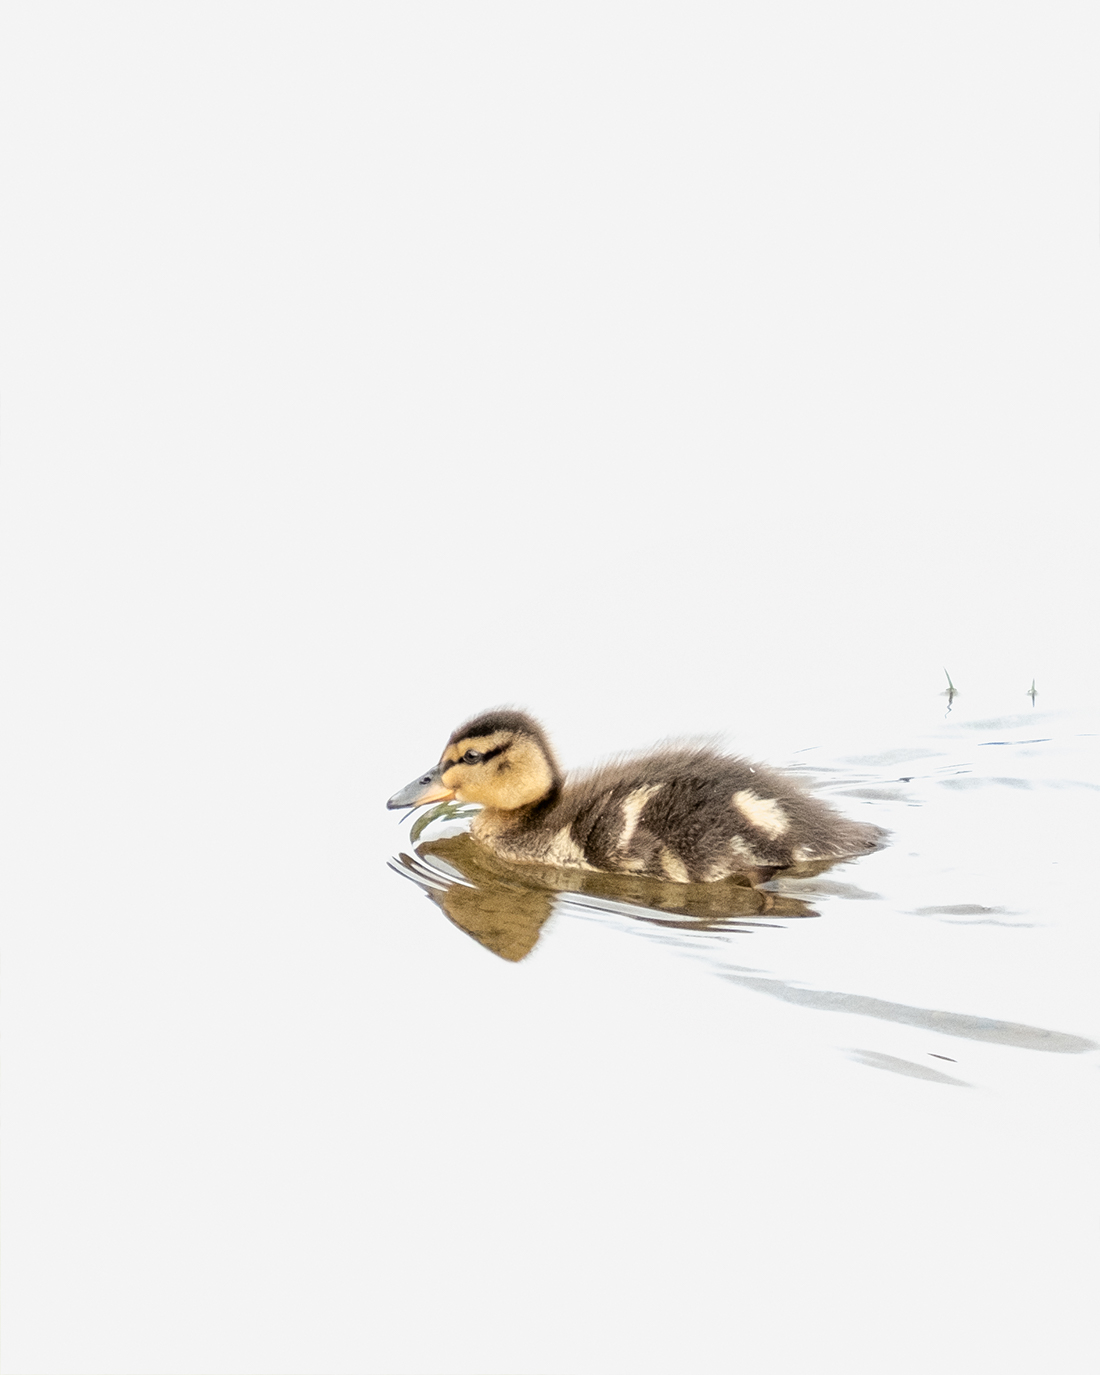 DSCF8662-1-WEB andunge duckling stokkand mallard ciliestad cecilie jystad